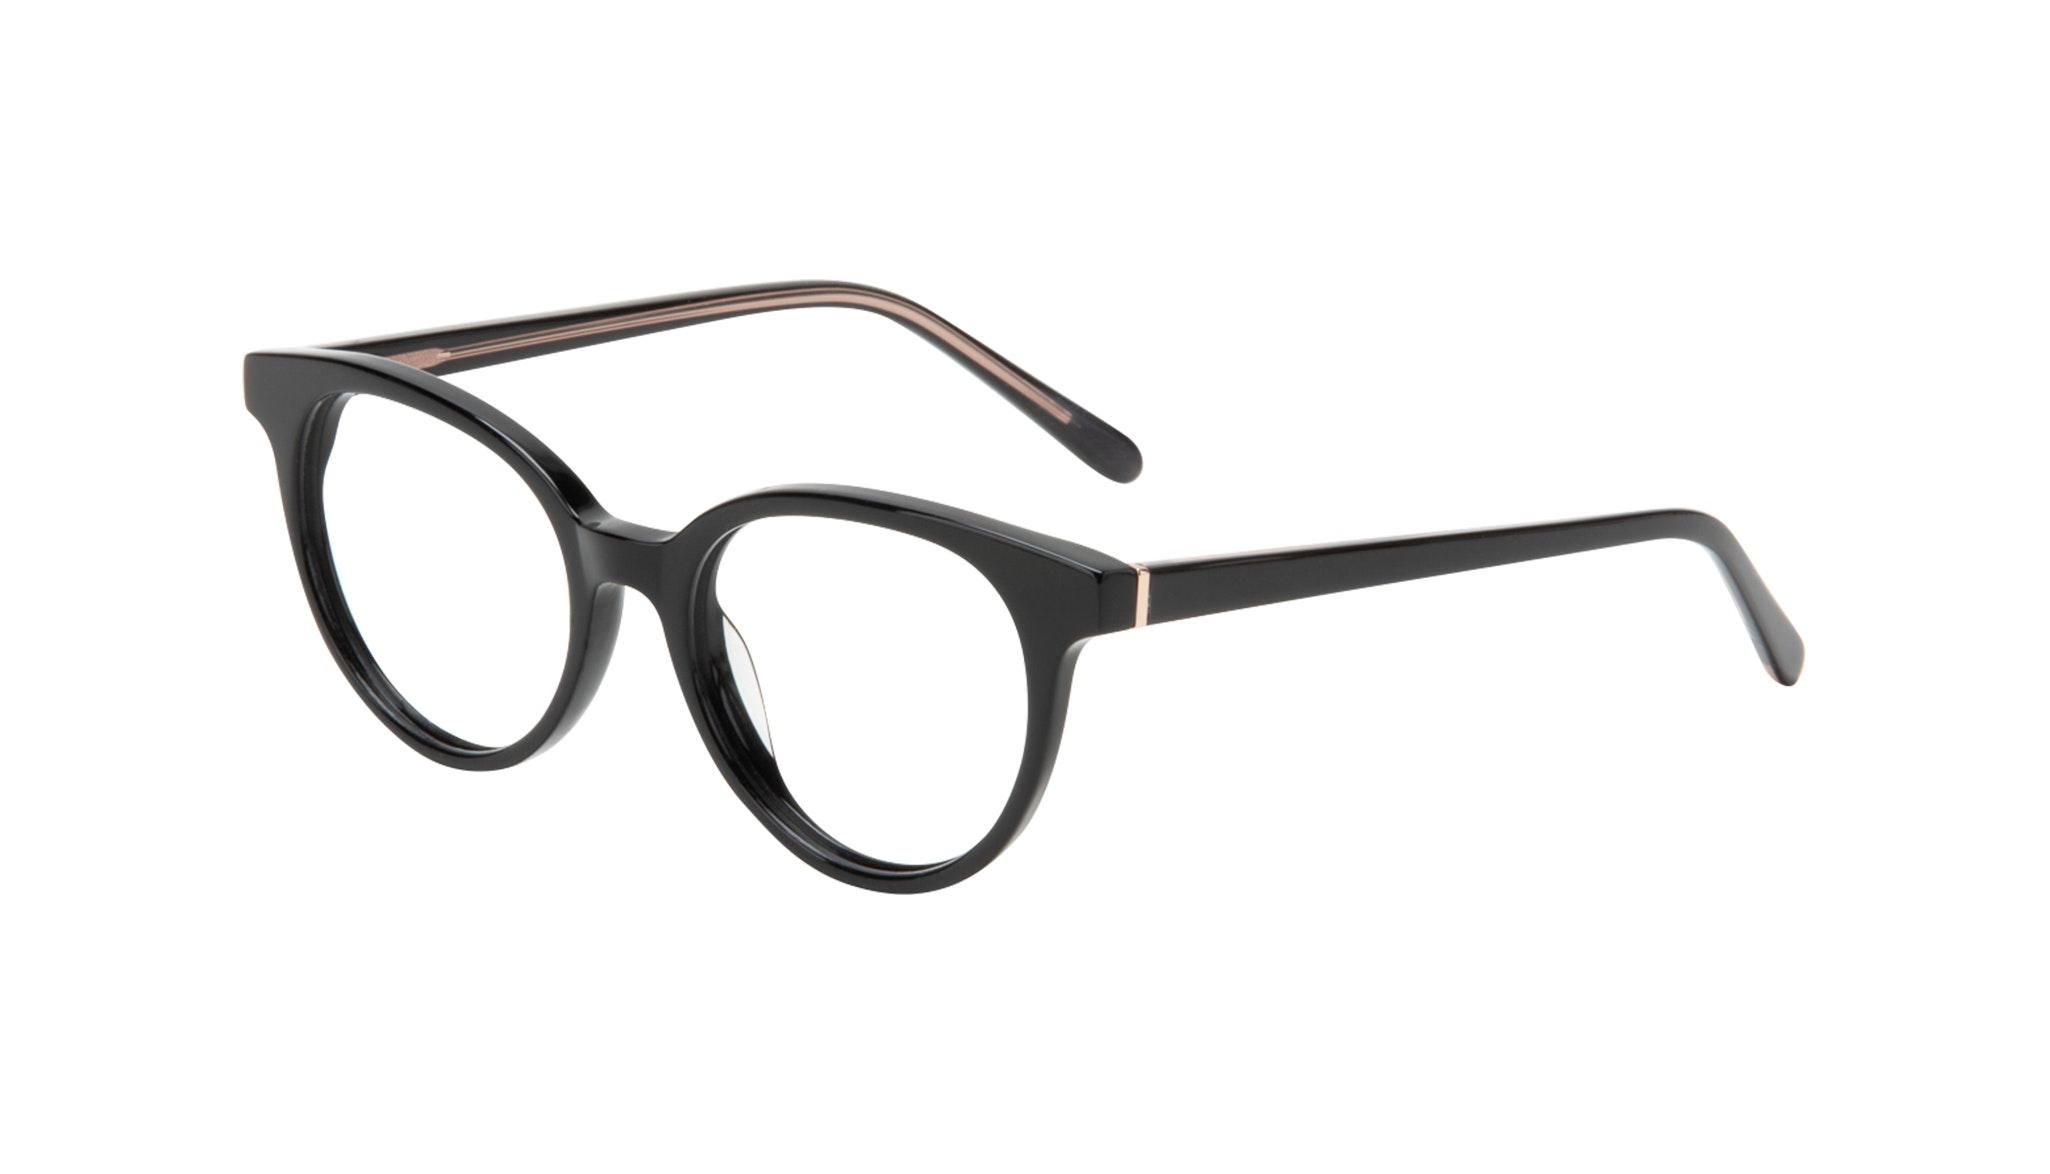 Affordable Fashion Glasses Round Eyeglasses Women Bright Black Tilt